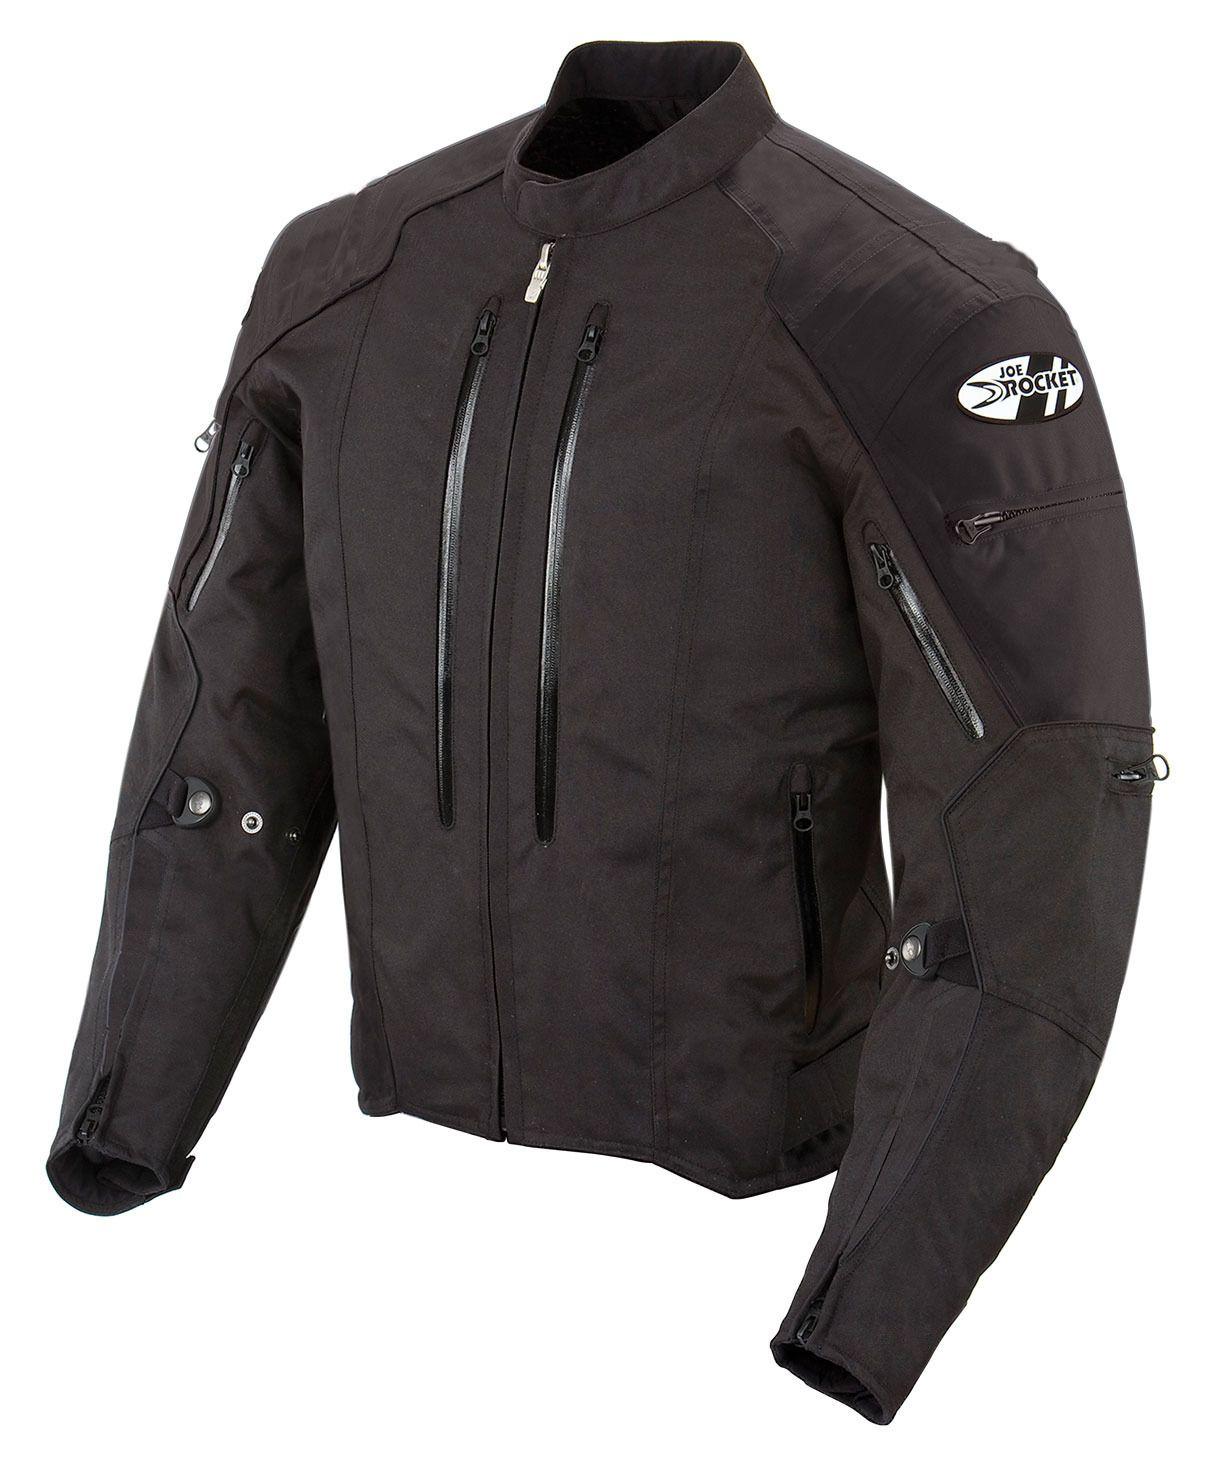 Rocket Motorcycle Jacket